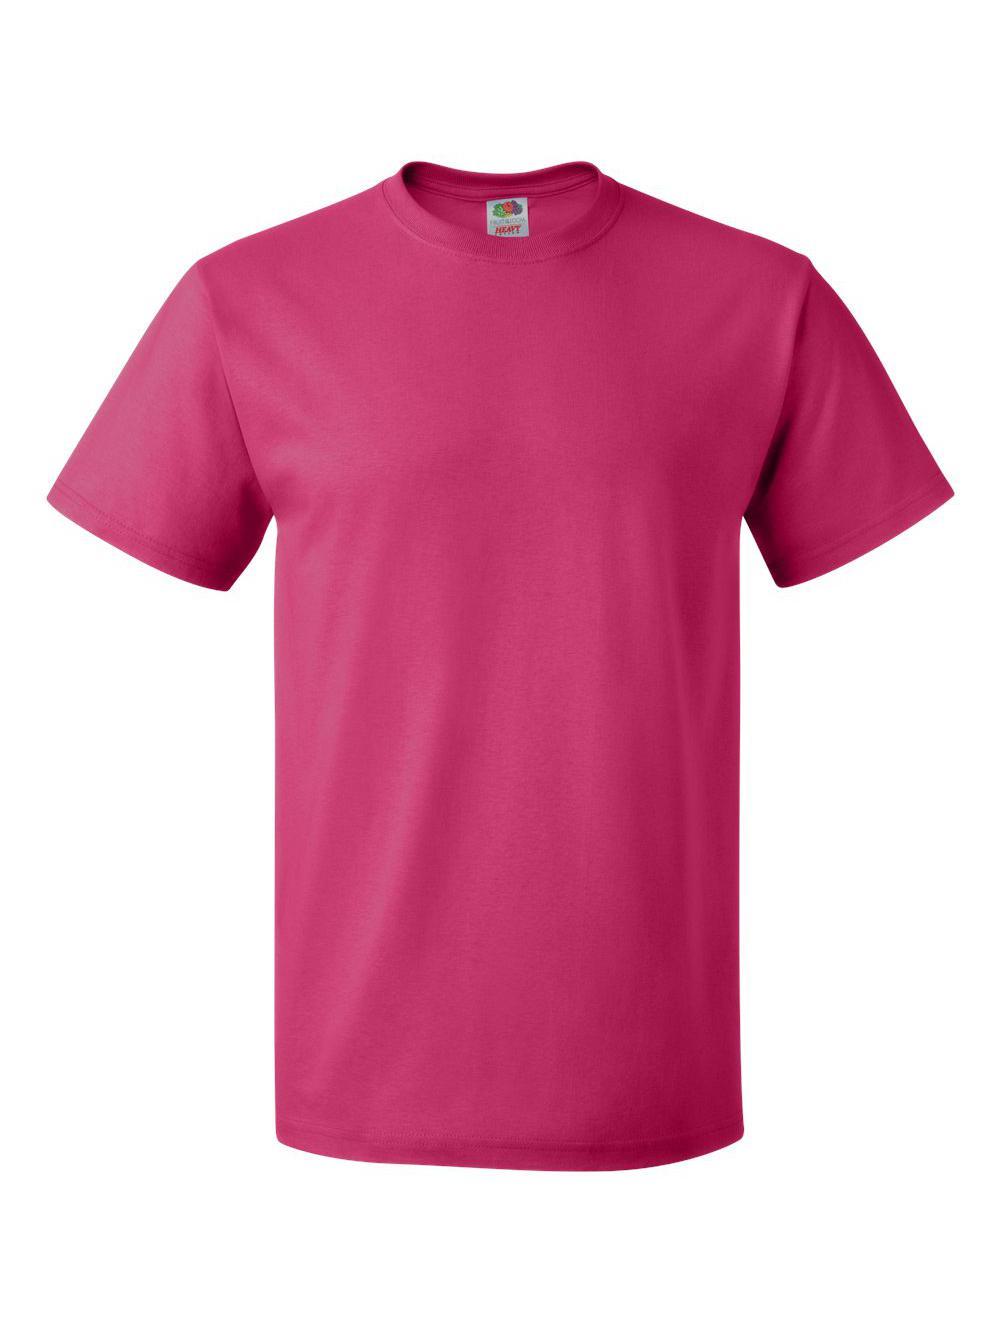 Fruit-of-the-Loom-HD-Cotton-Short-Sleeve-T-Shirt-3930R thumbnail 42